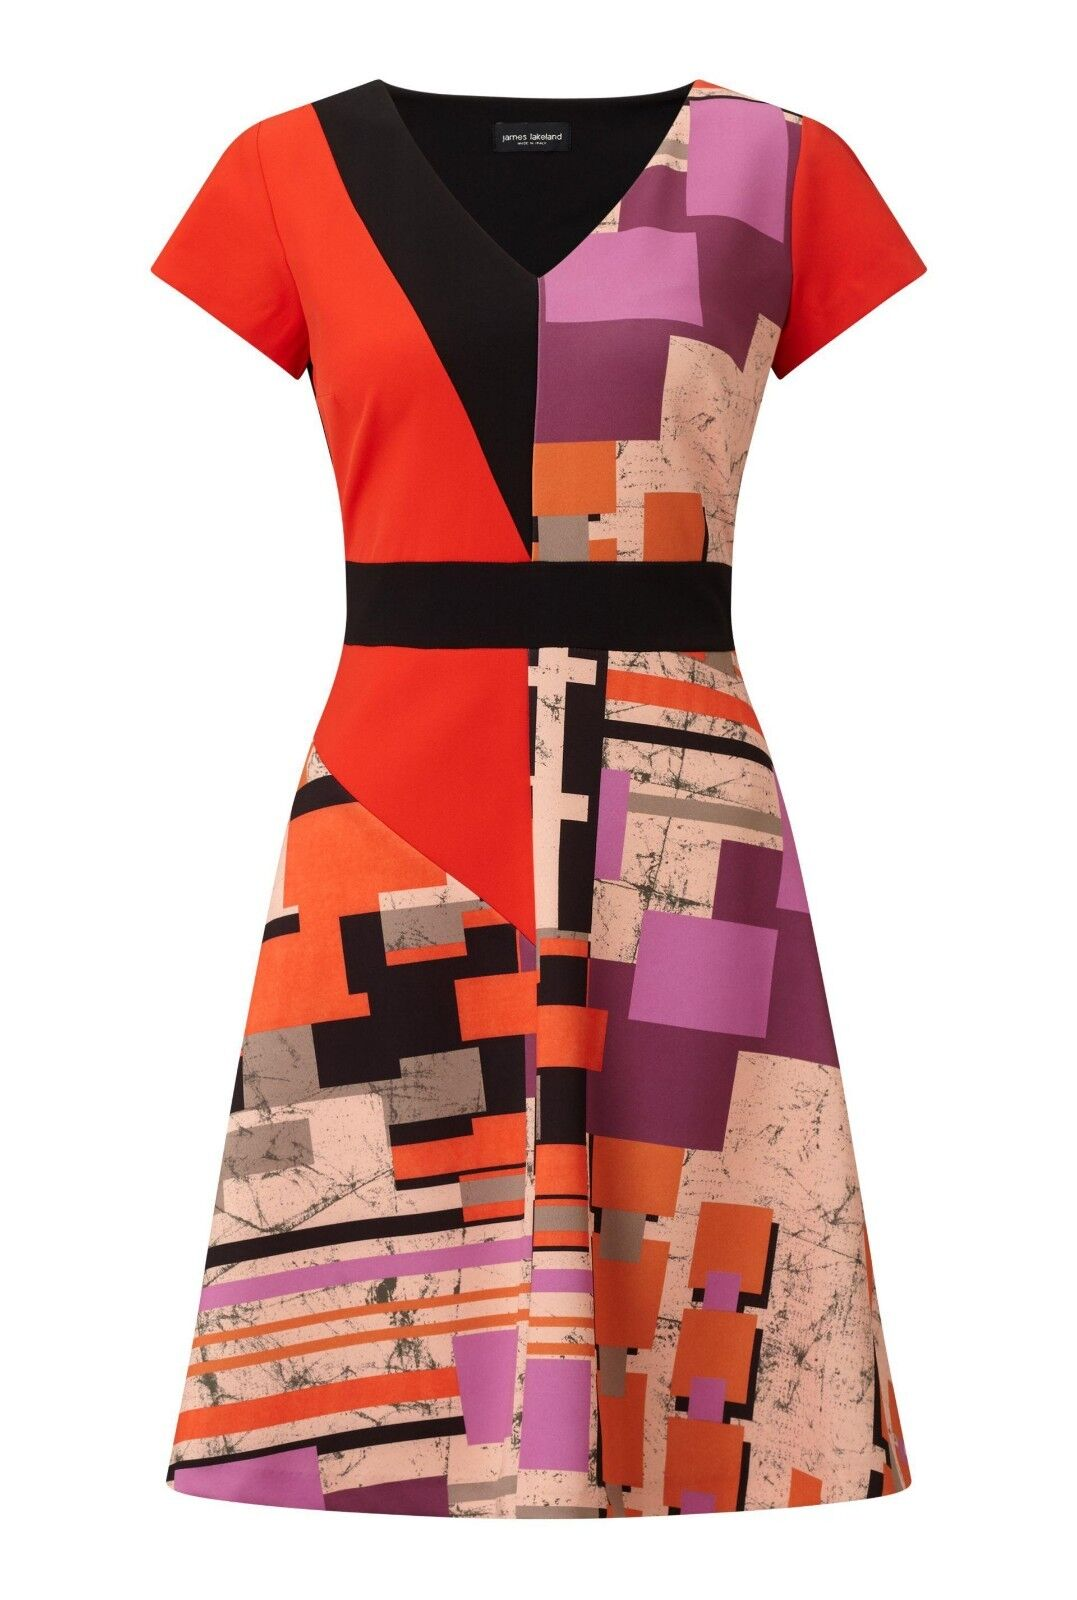 James Lakeland Geometric Print Dress rot Größe UK 12 rrp  DH087 PP 16